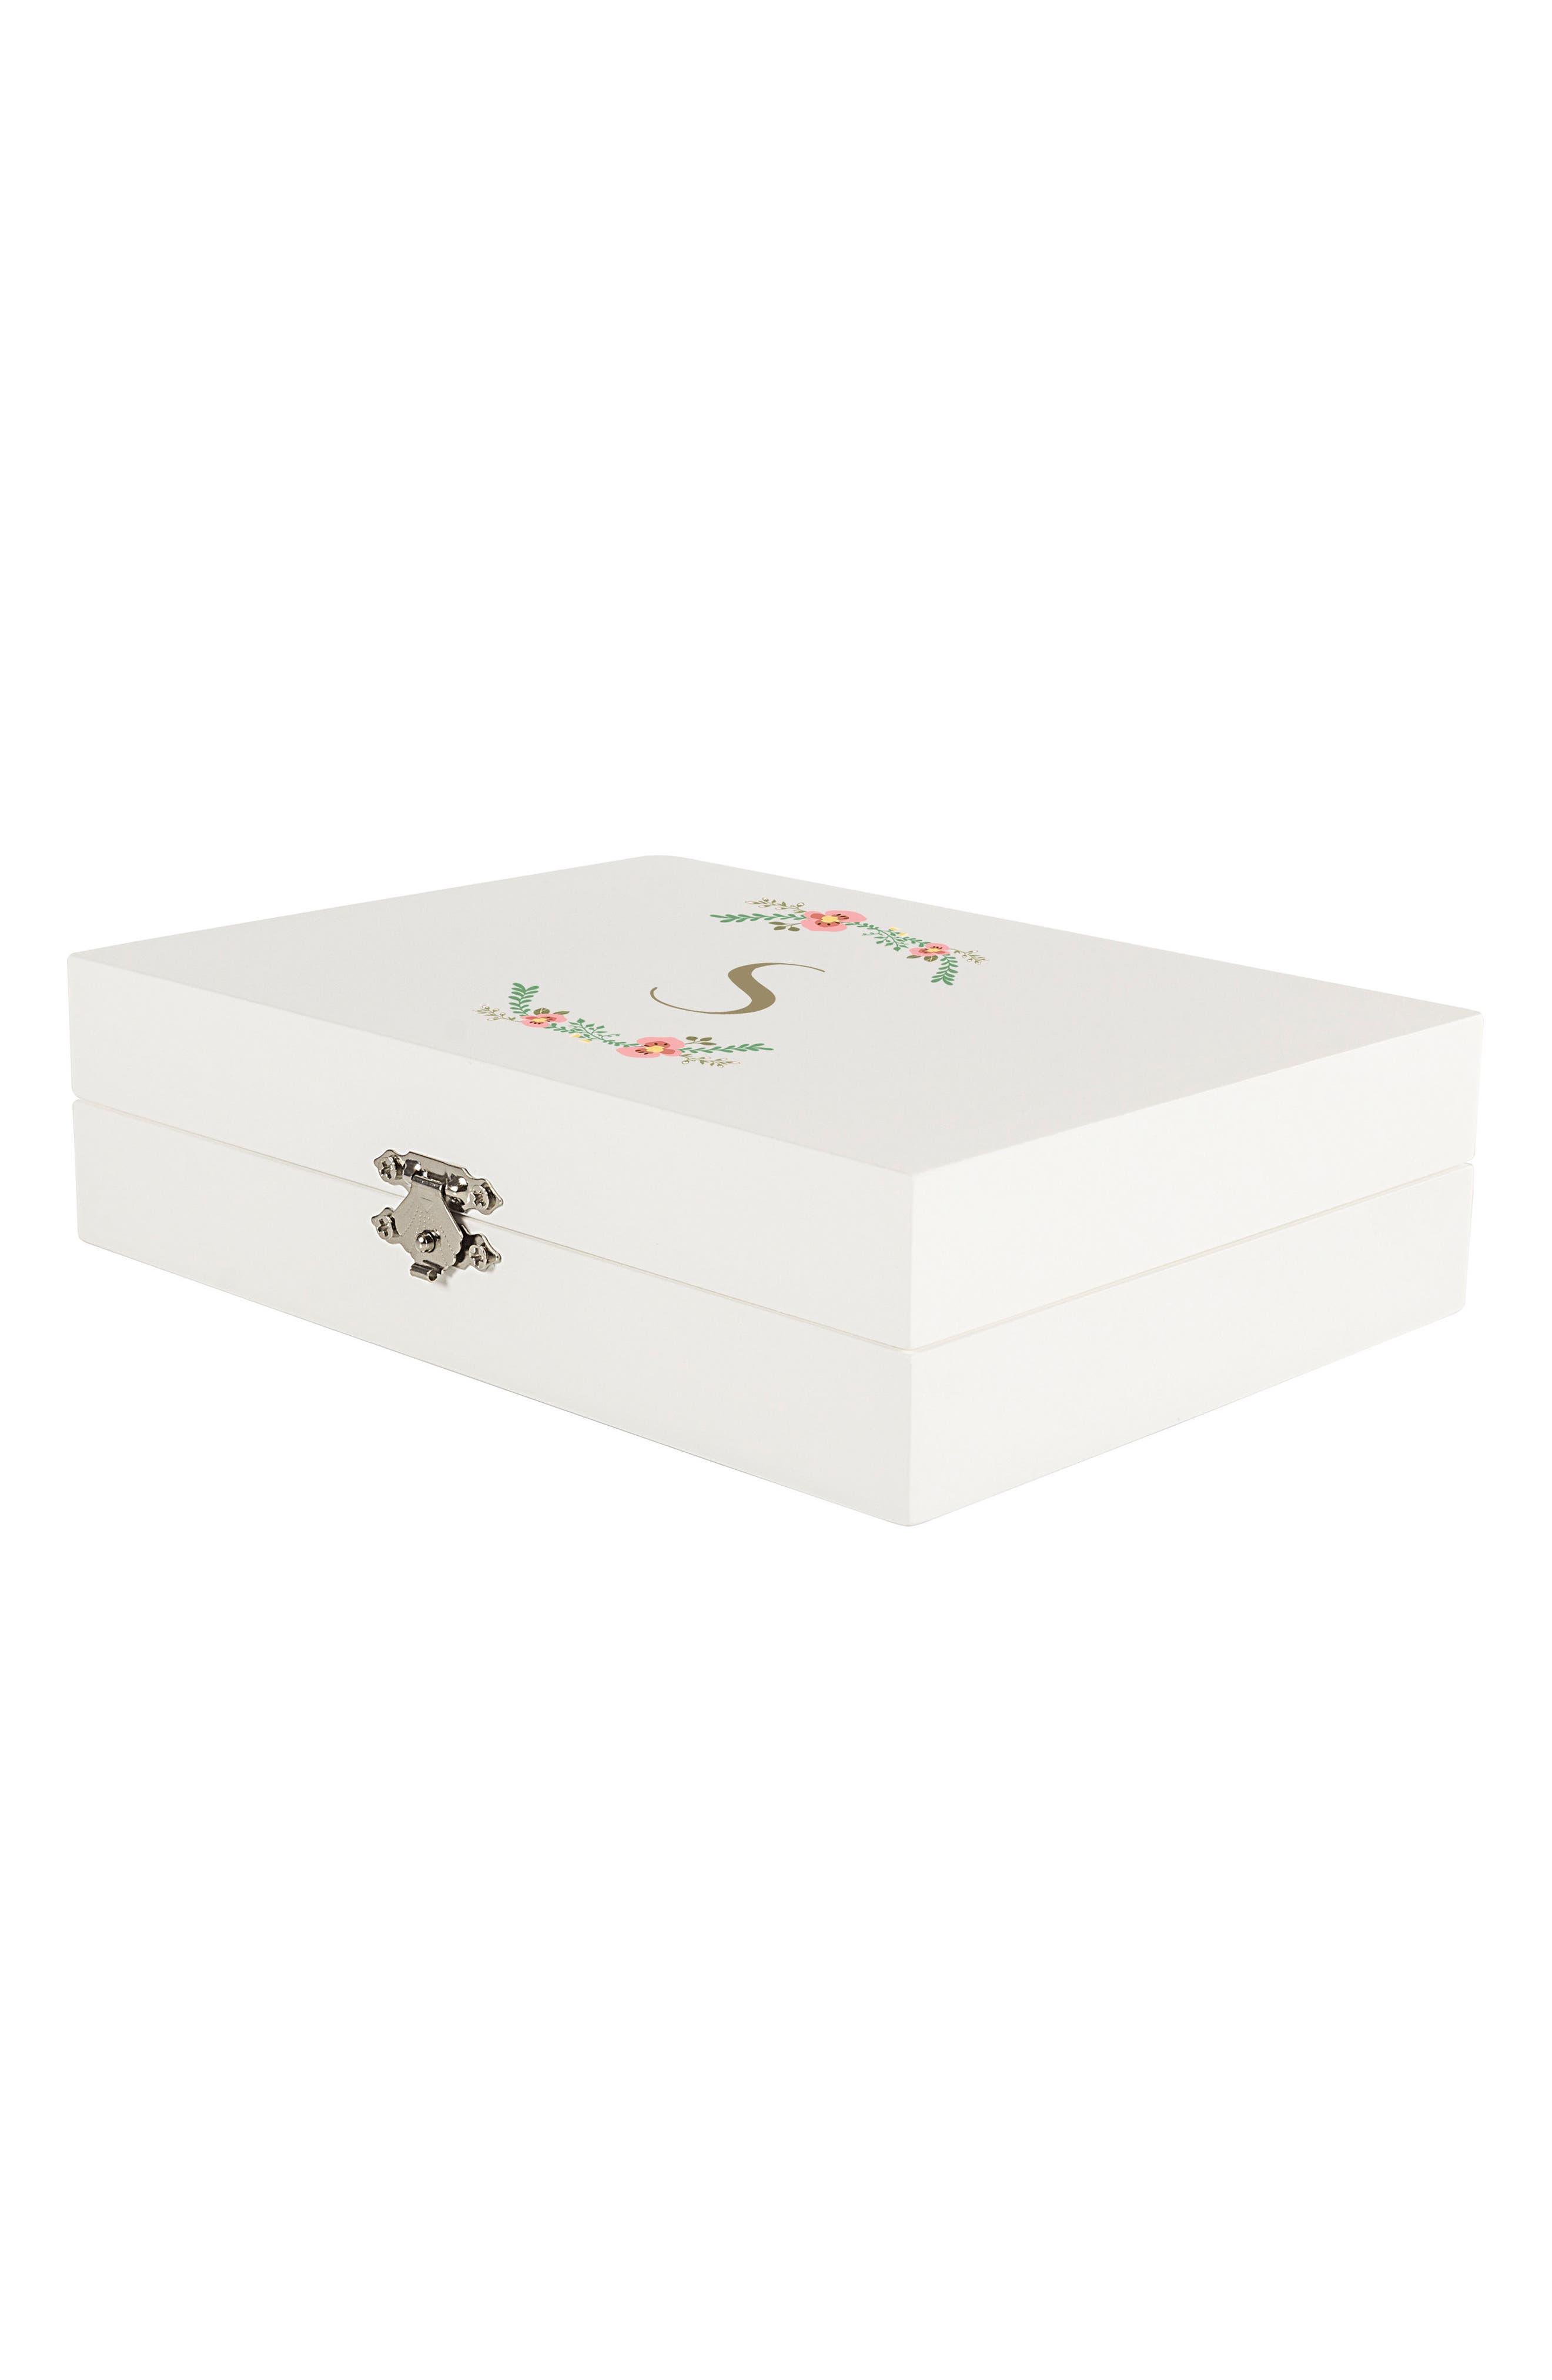 Monogram Floral Wedding Ring Box,                             Alternate thumbnail 30, color,